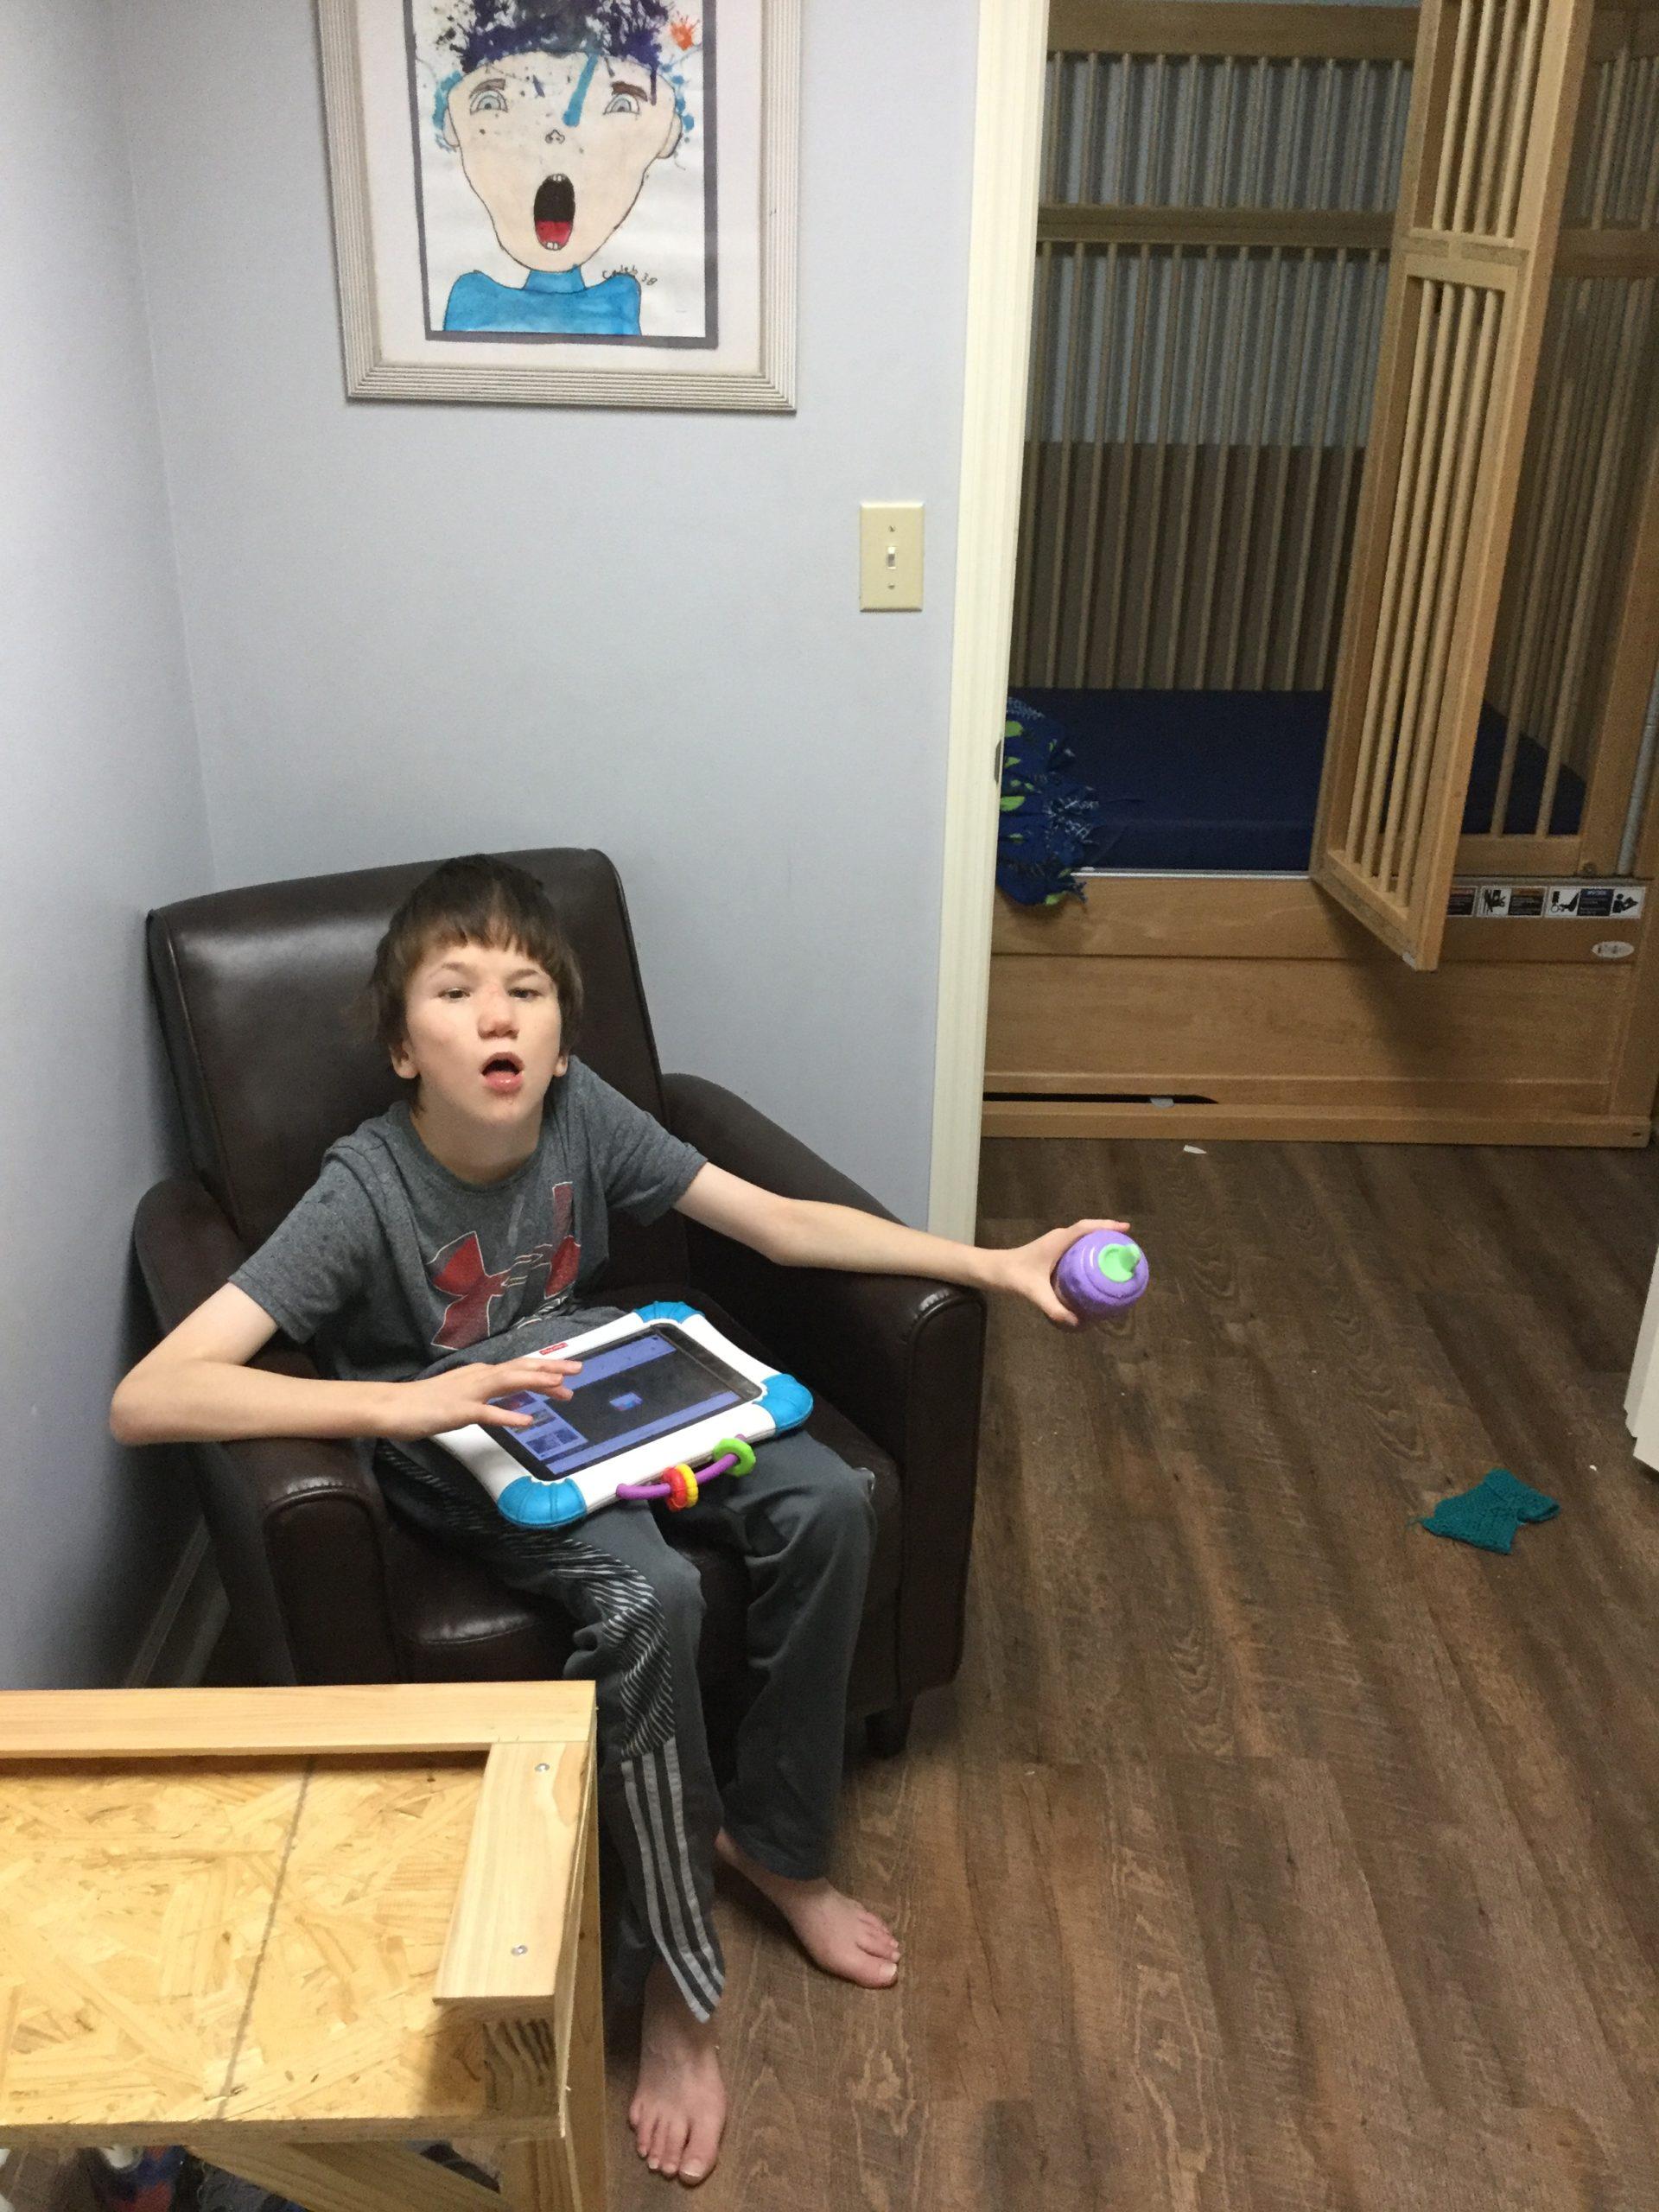 Luke at home with iPad